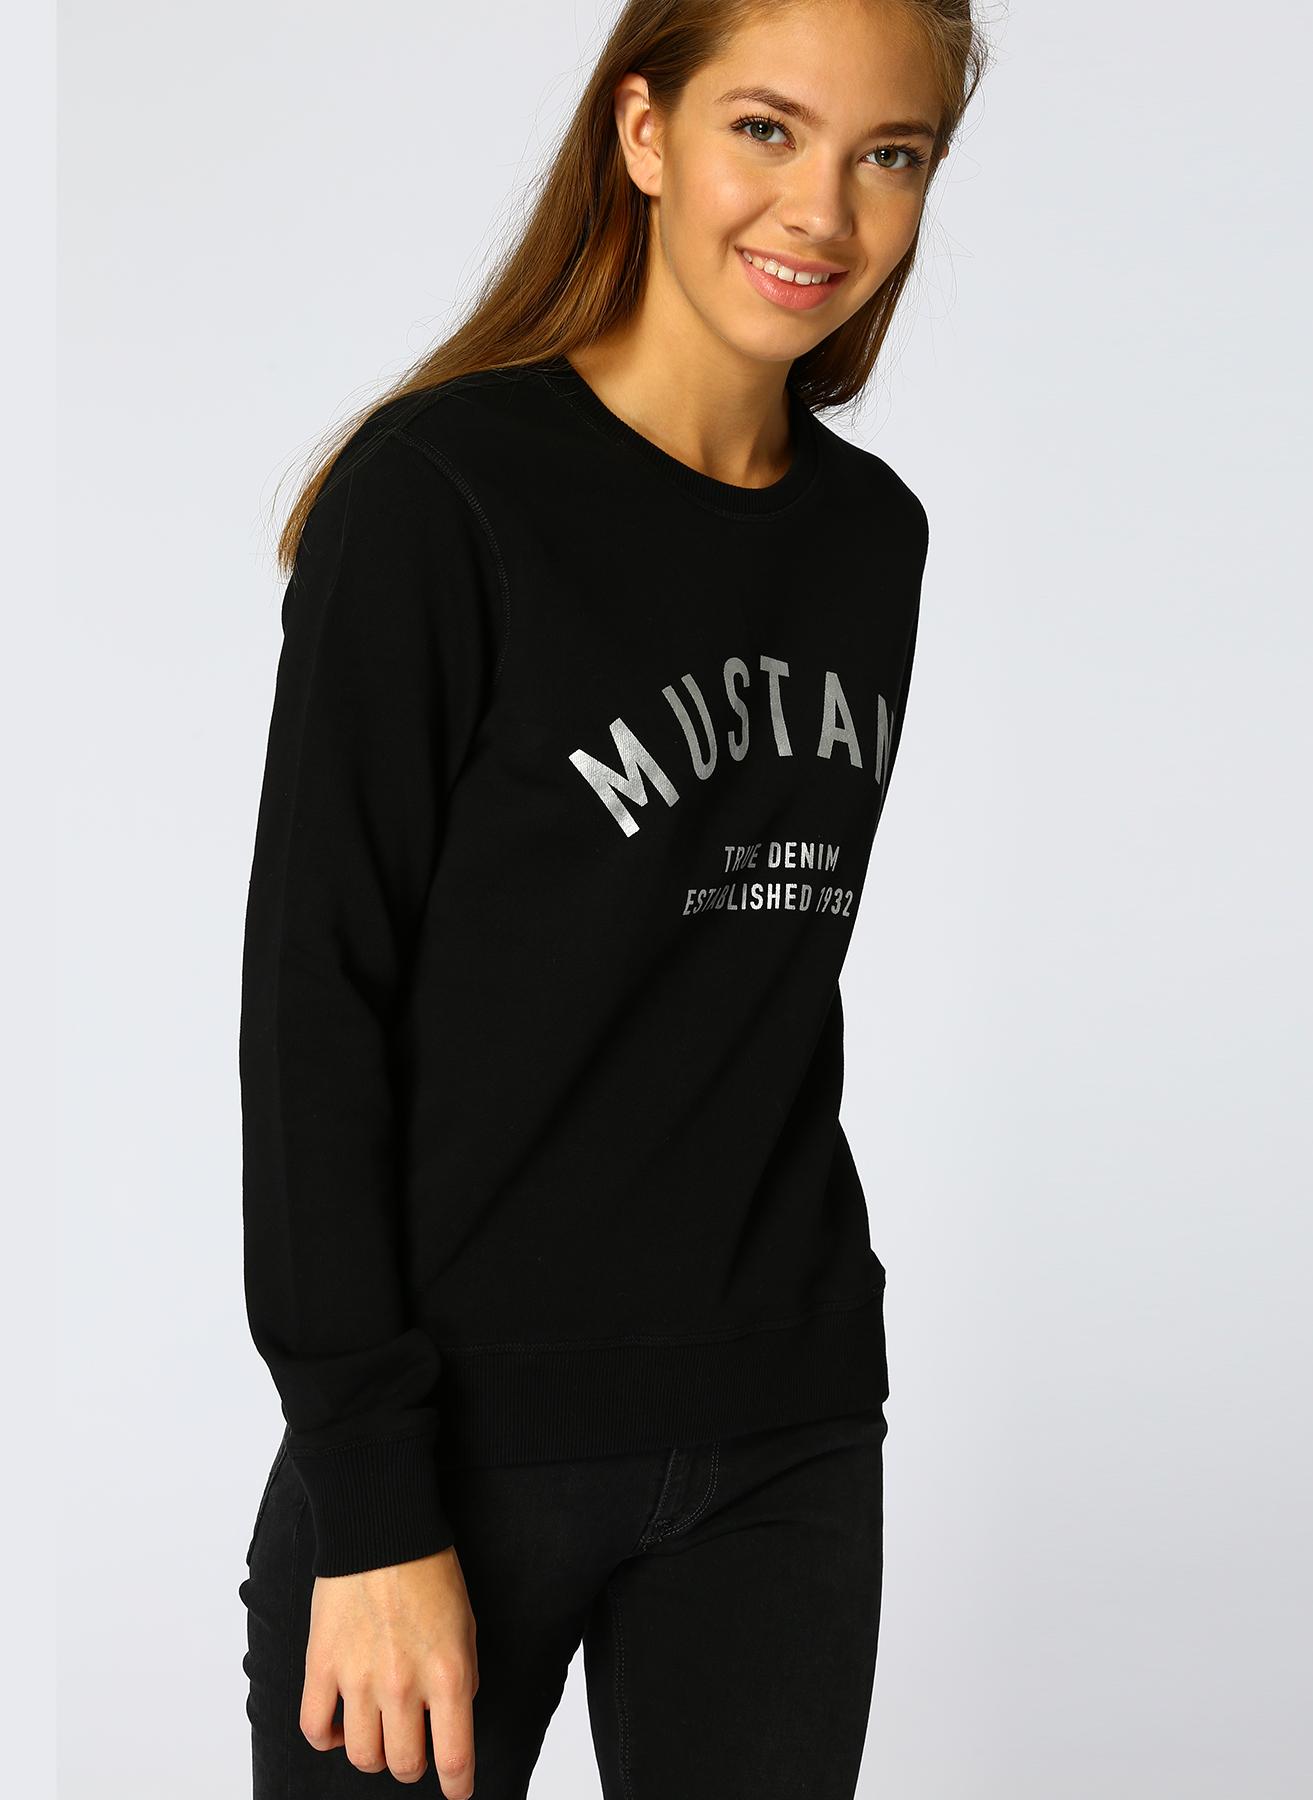 Mustang Yazılı Siyah Sweatshirt XS 5001697758004 Ürün Resmi